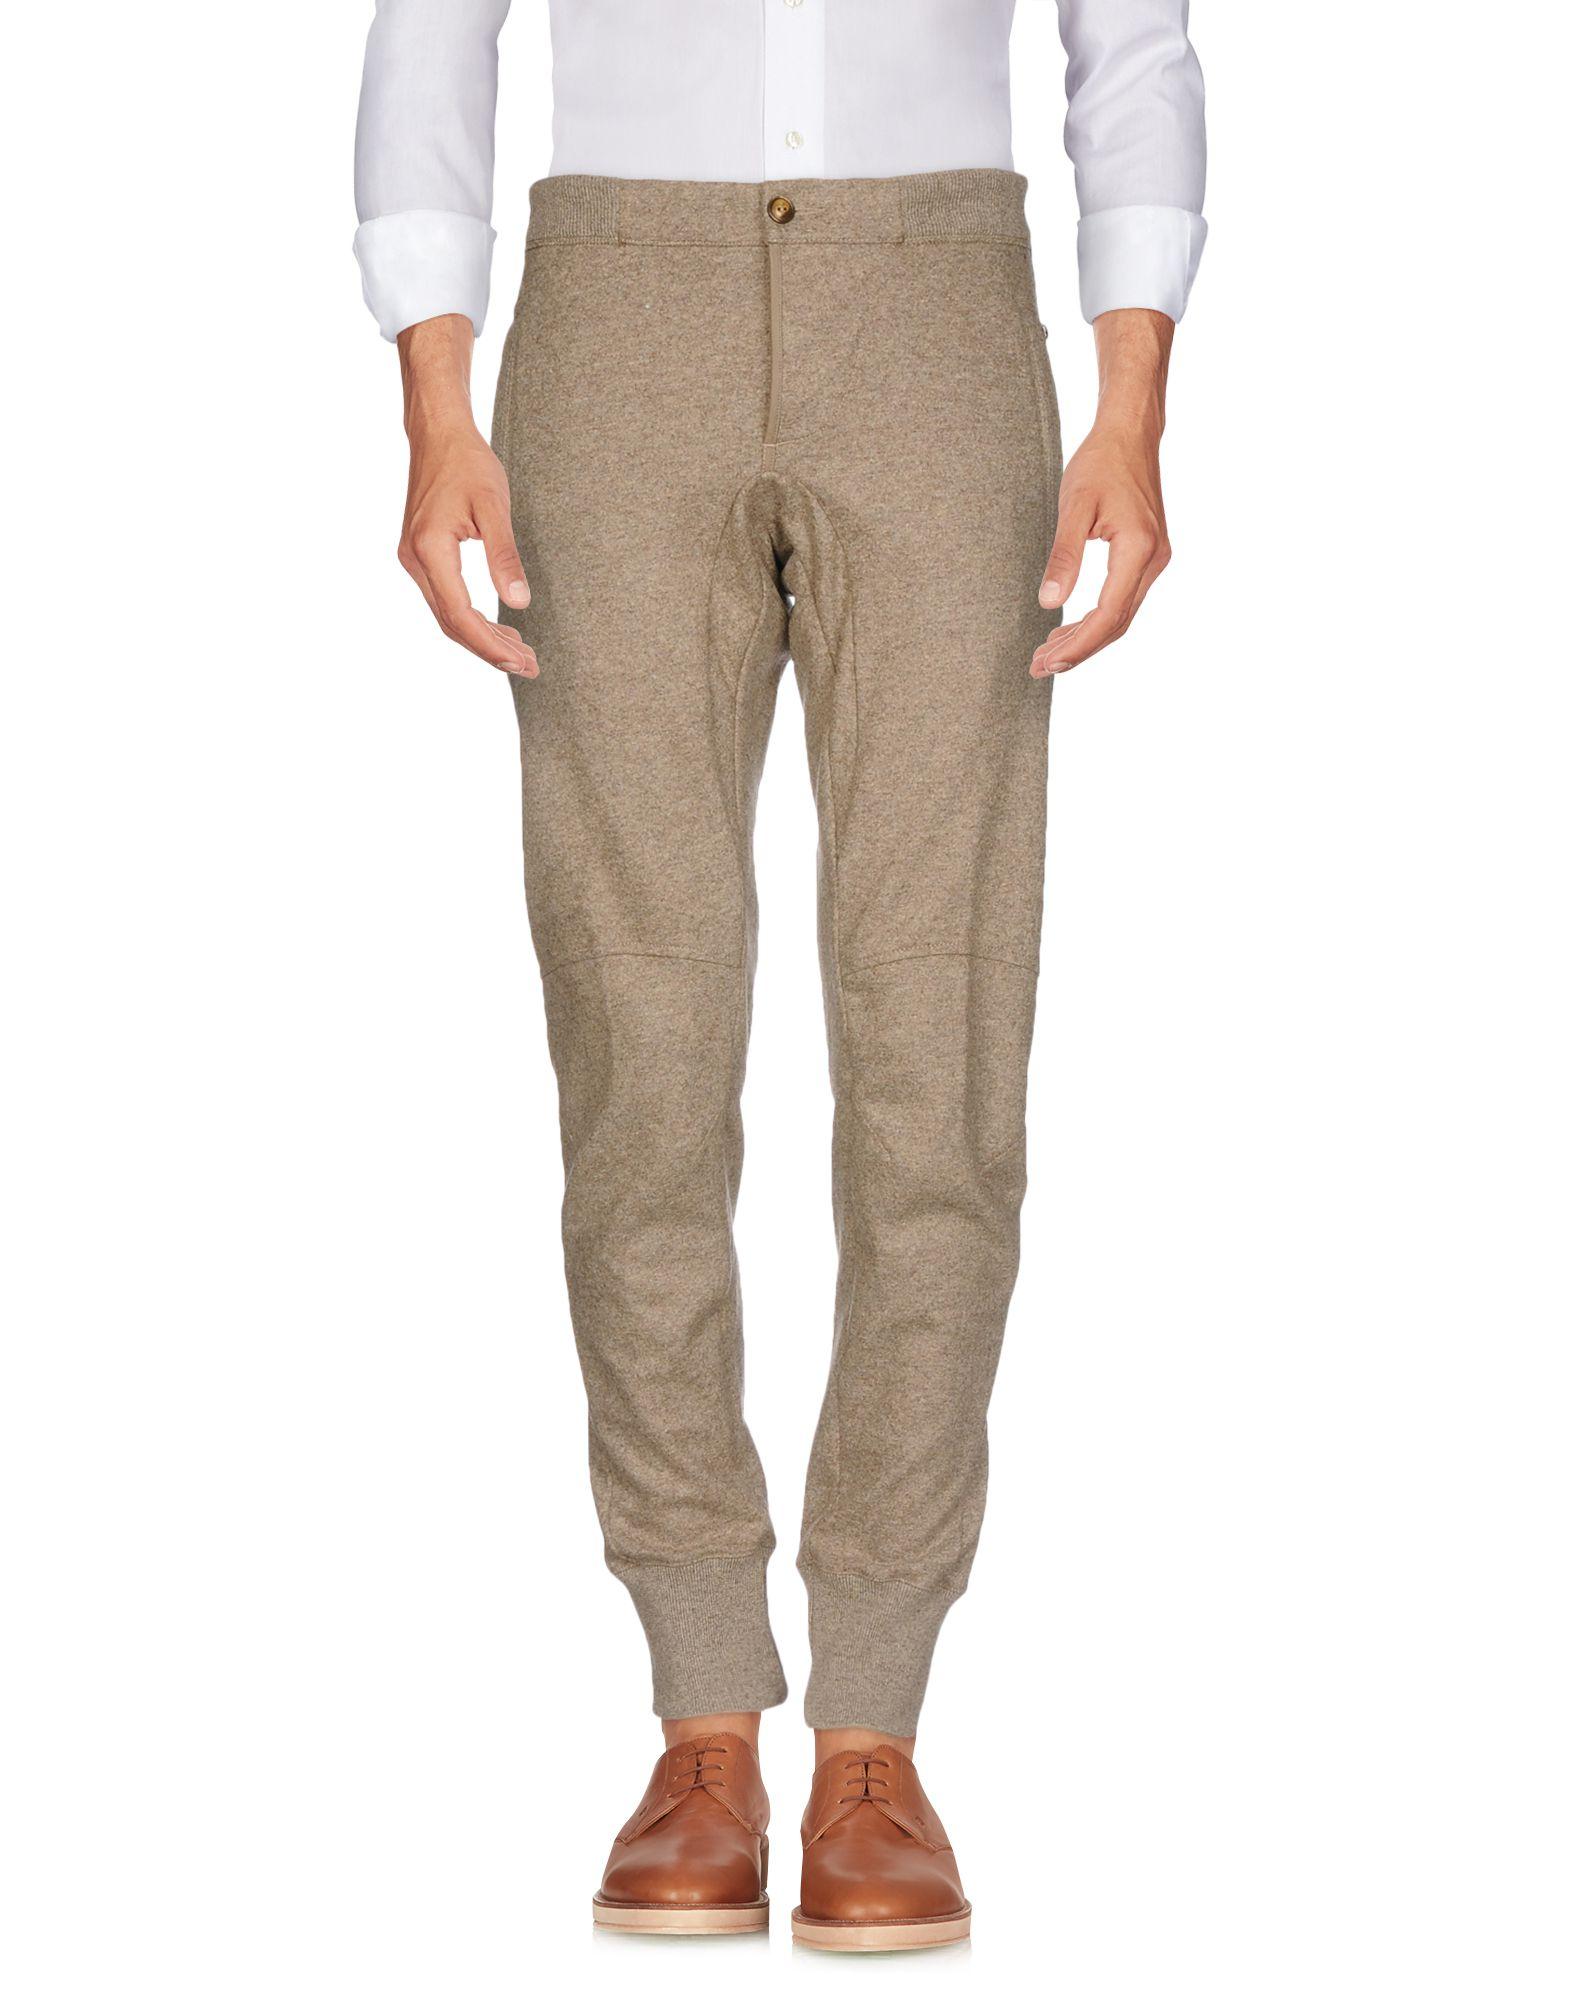 Pantalone Coast Weber & Ahaus Donna - Acquista online su